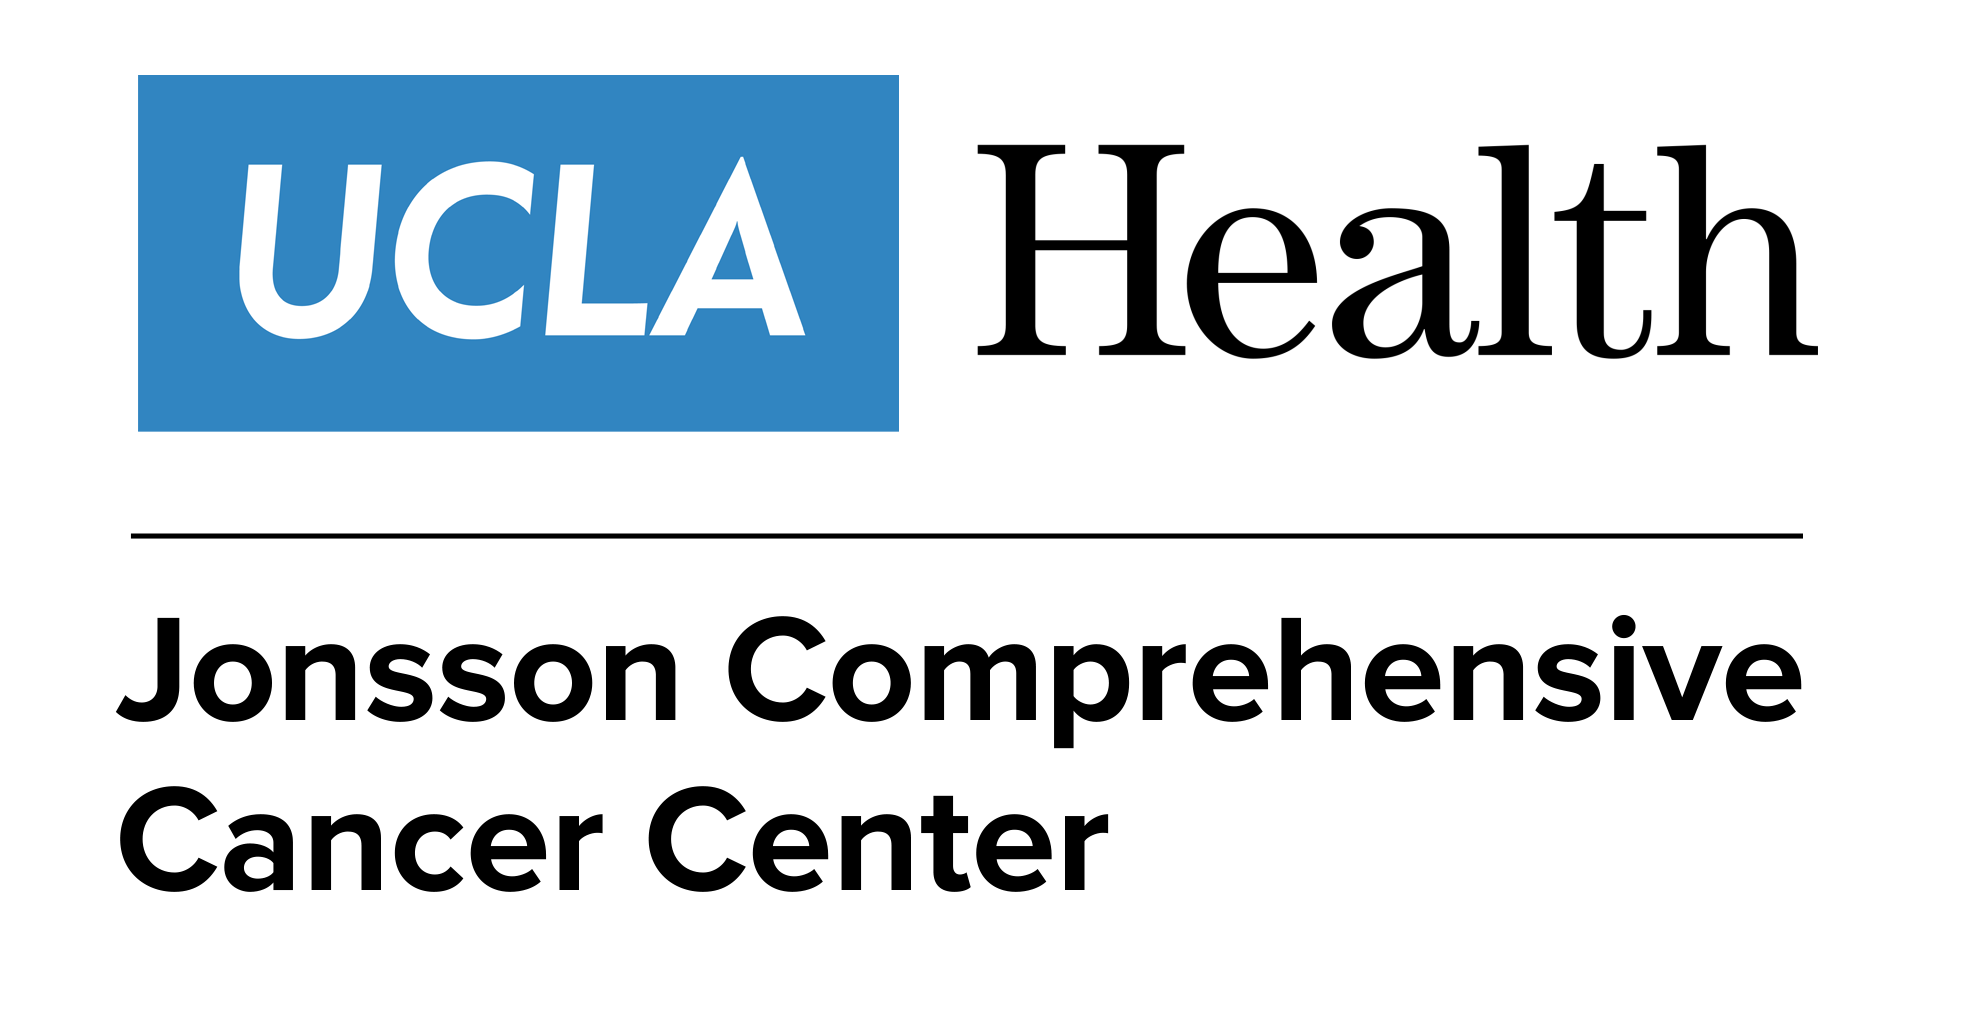 UCLA Health Jonsson Comprehensive Cancer Center